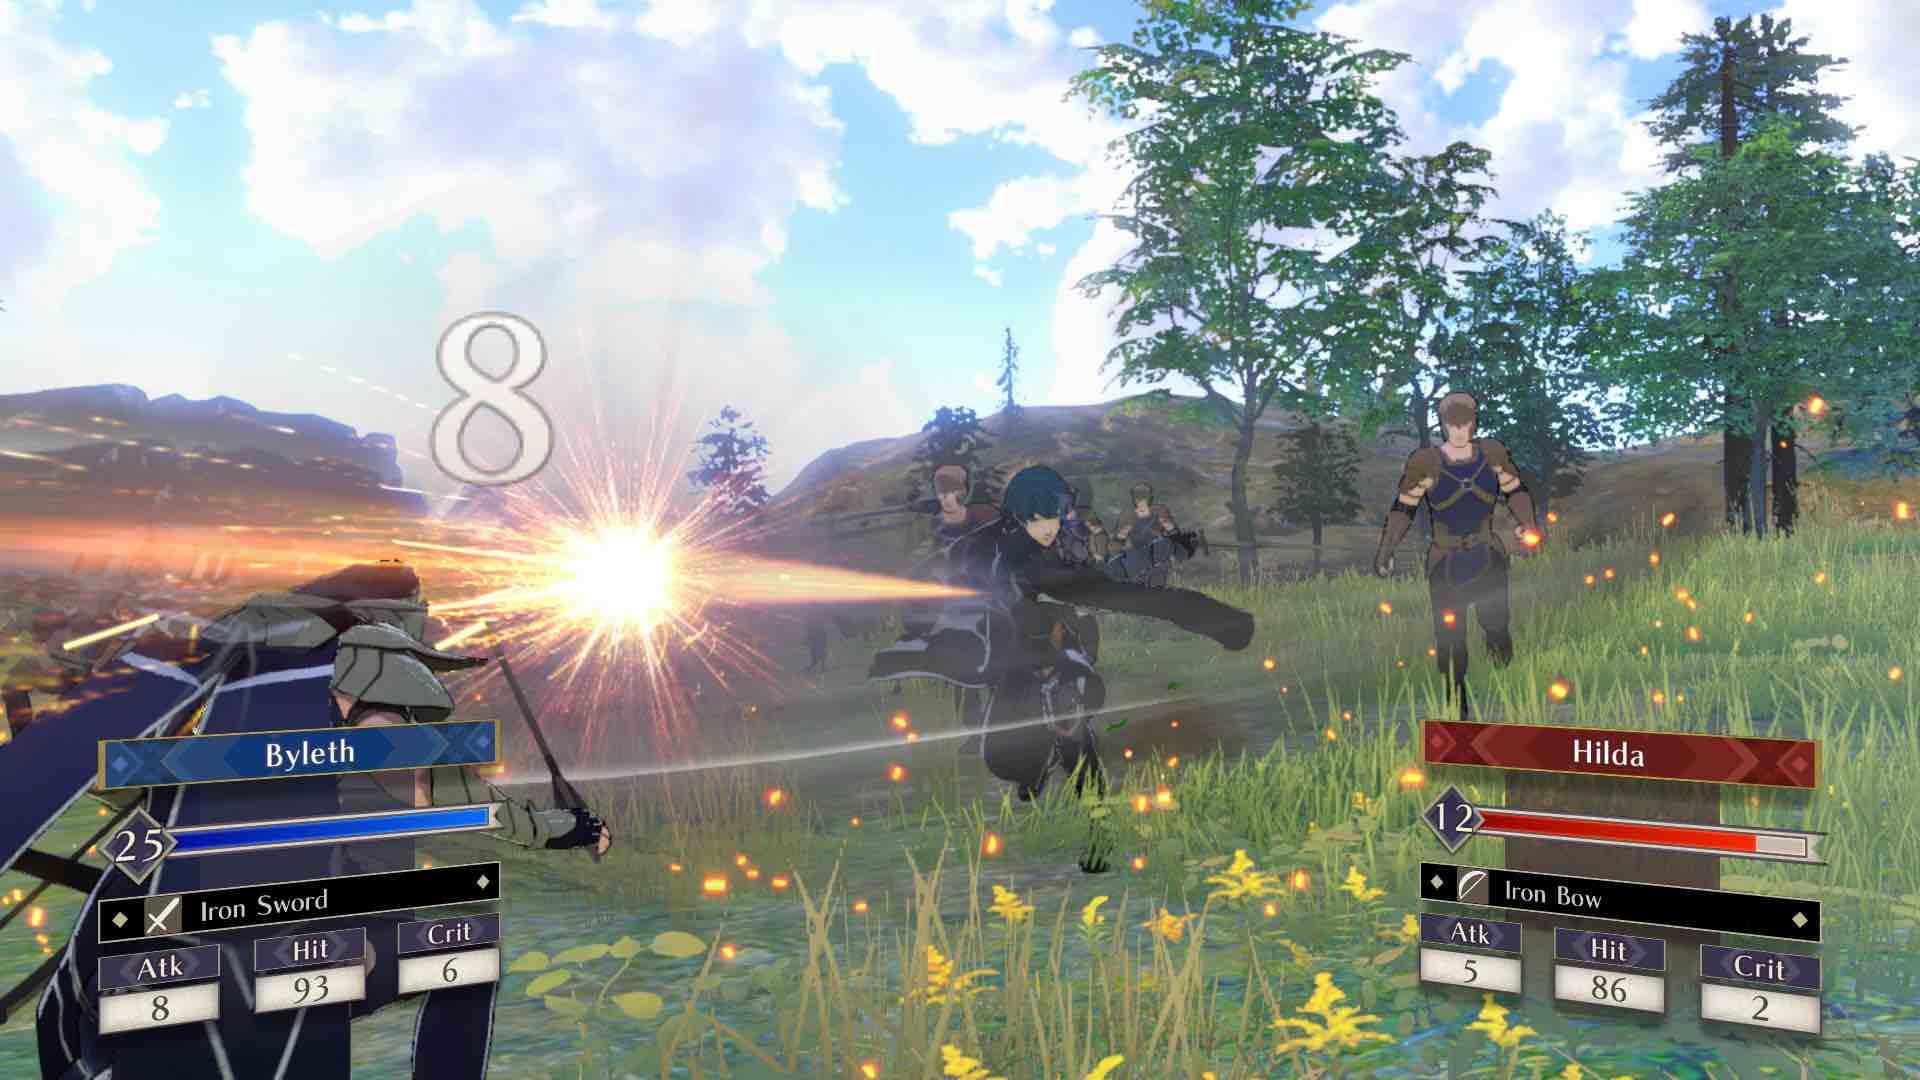 Fire Emblem: Three Houses E3 2018 Screenshot 3